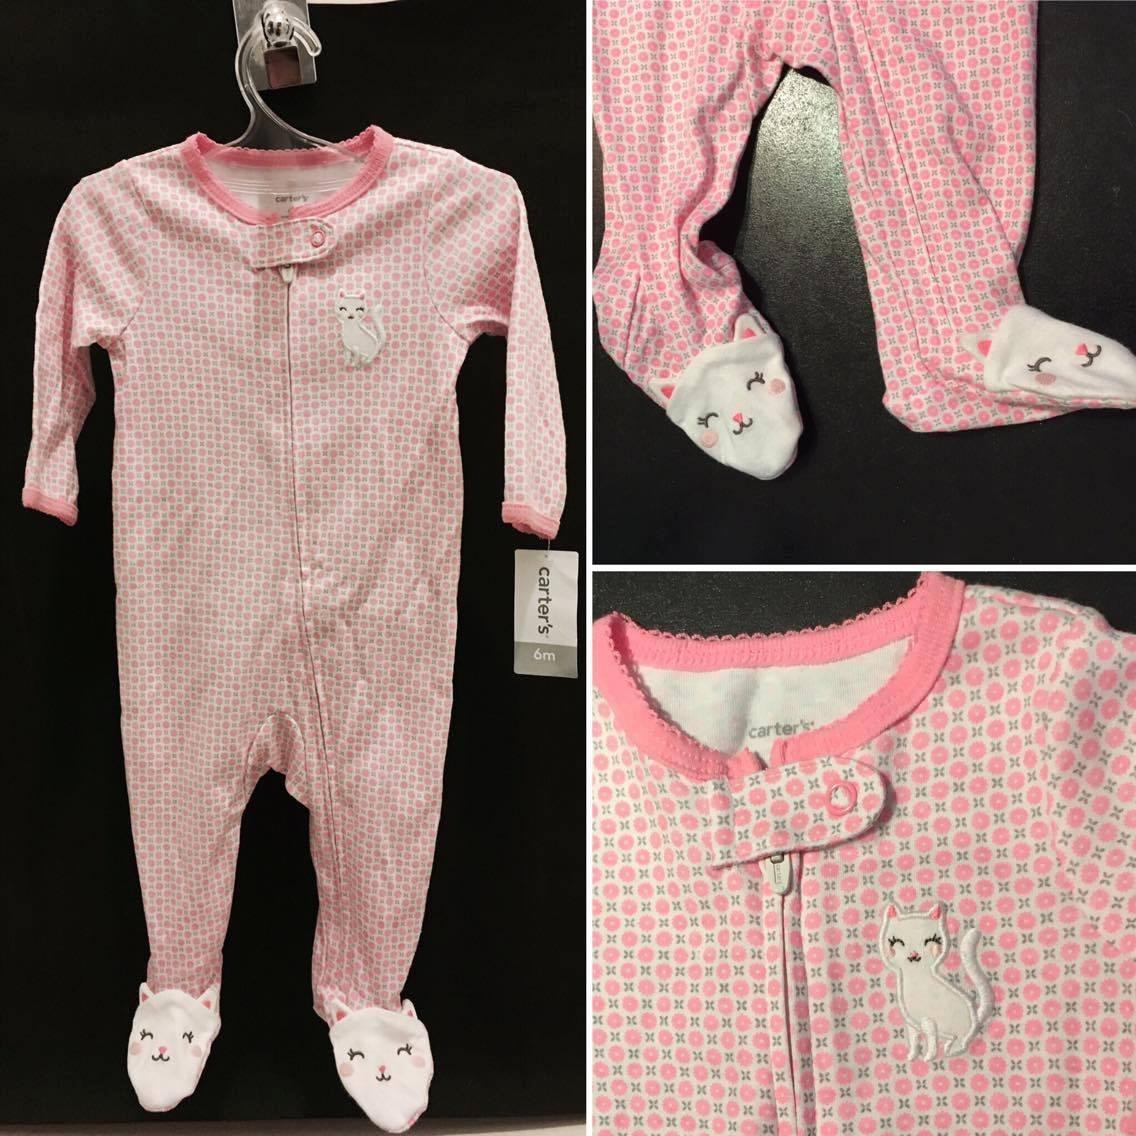 89d360da4 liquidación ropa bebe niña marca carters nueva talla 9 meses. Cargando zoom.